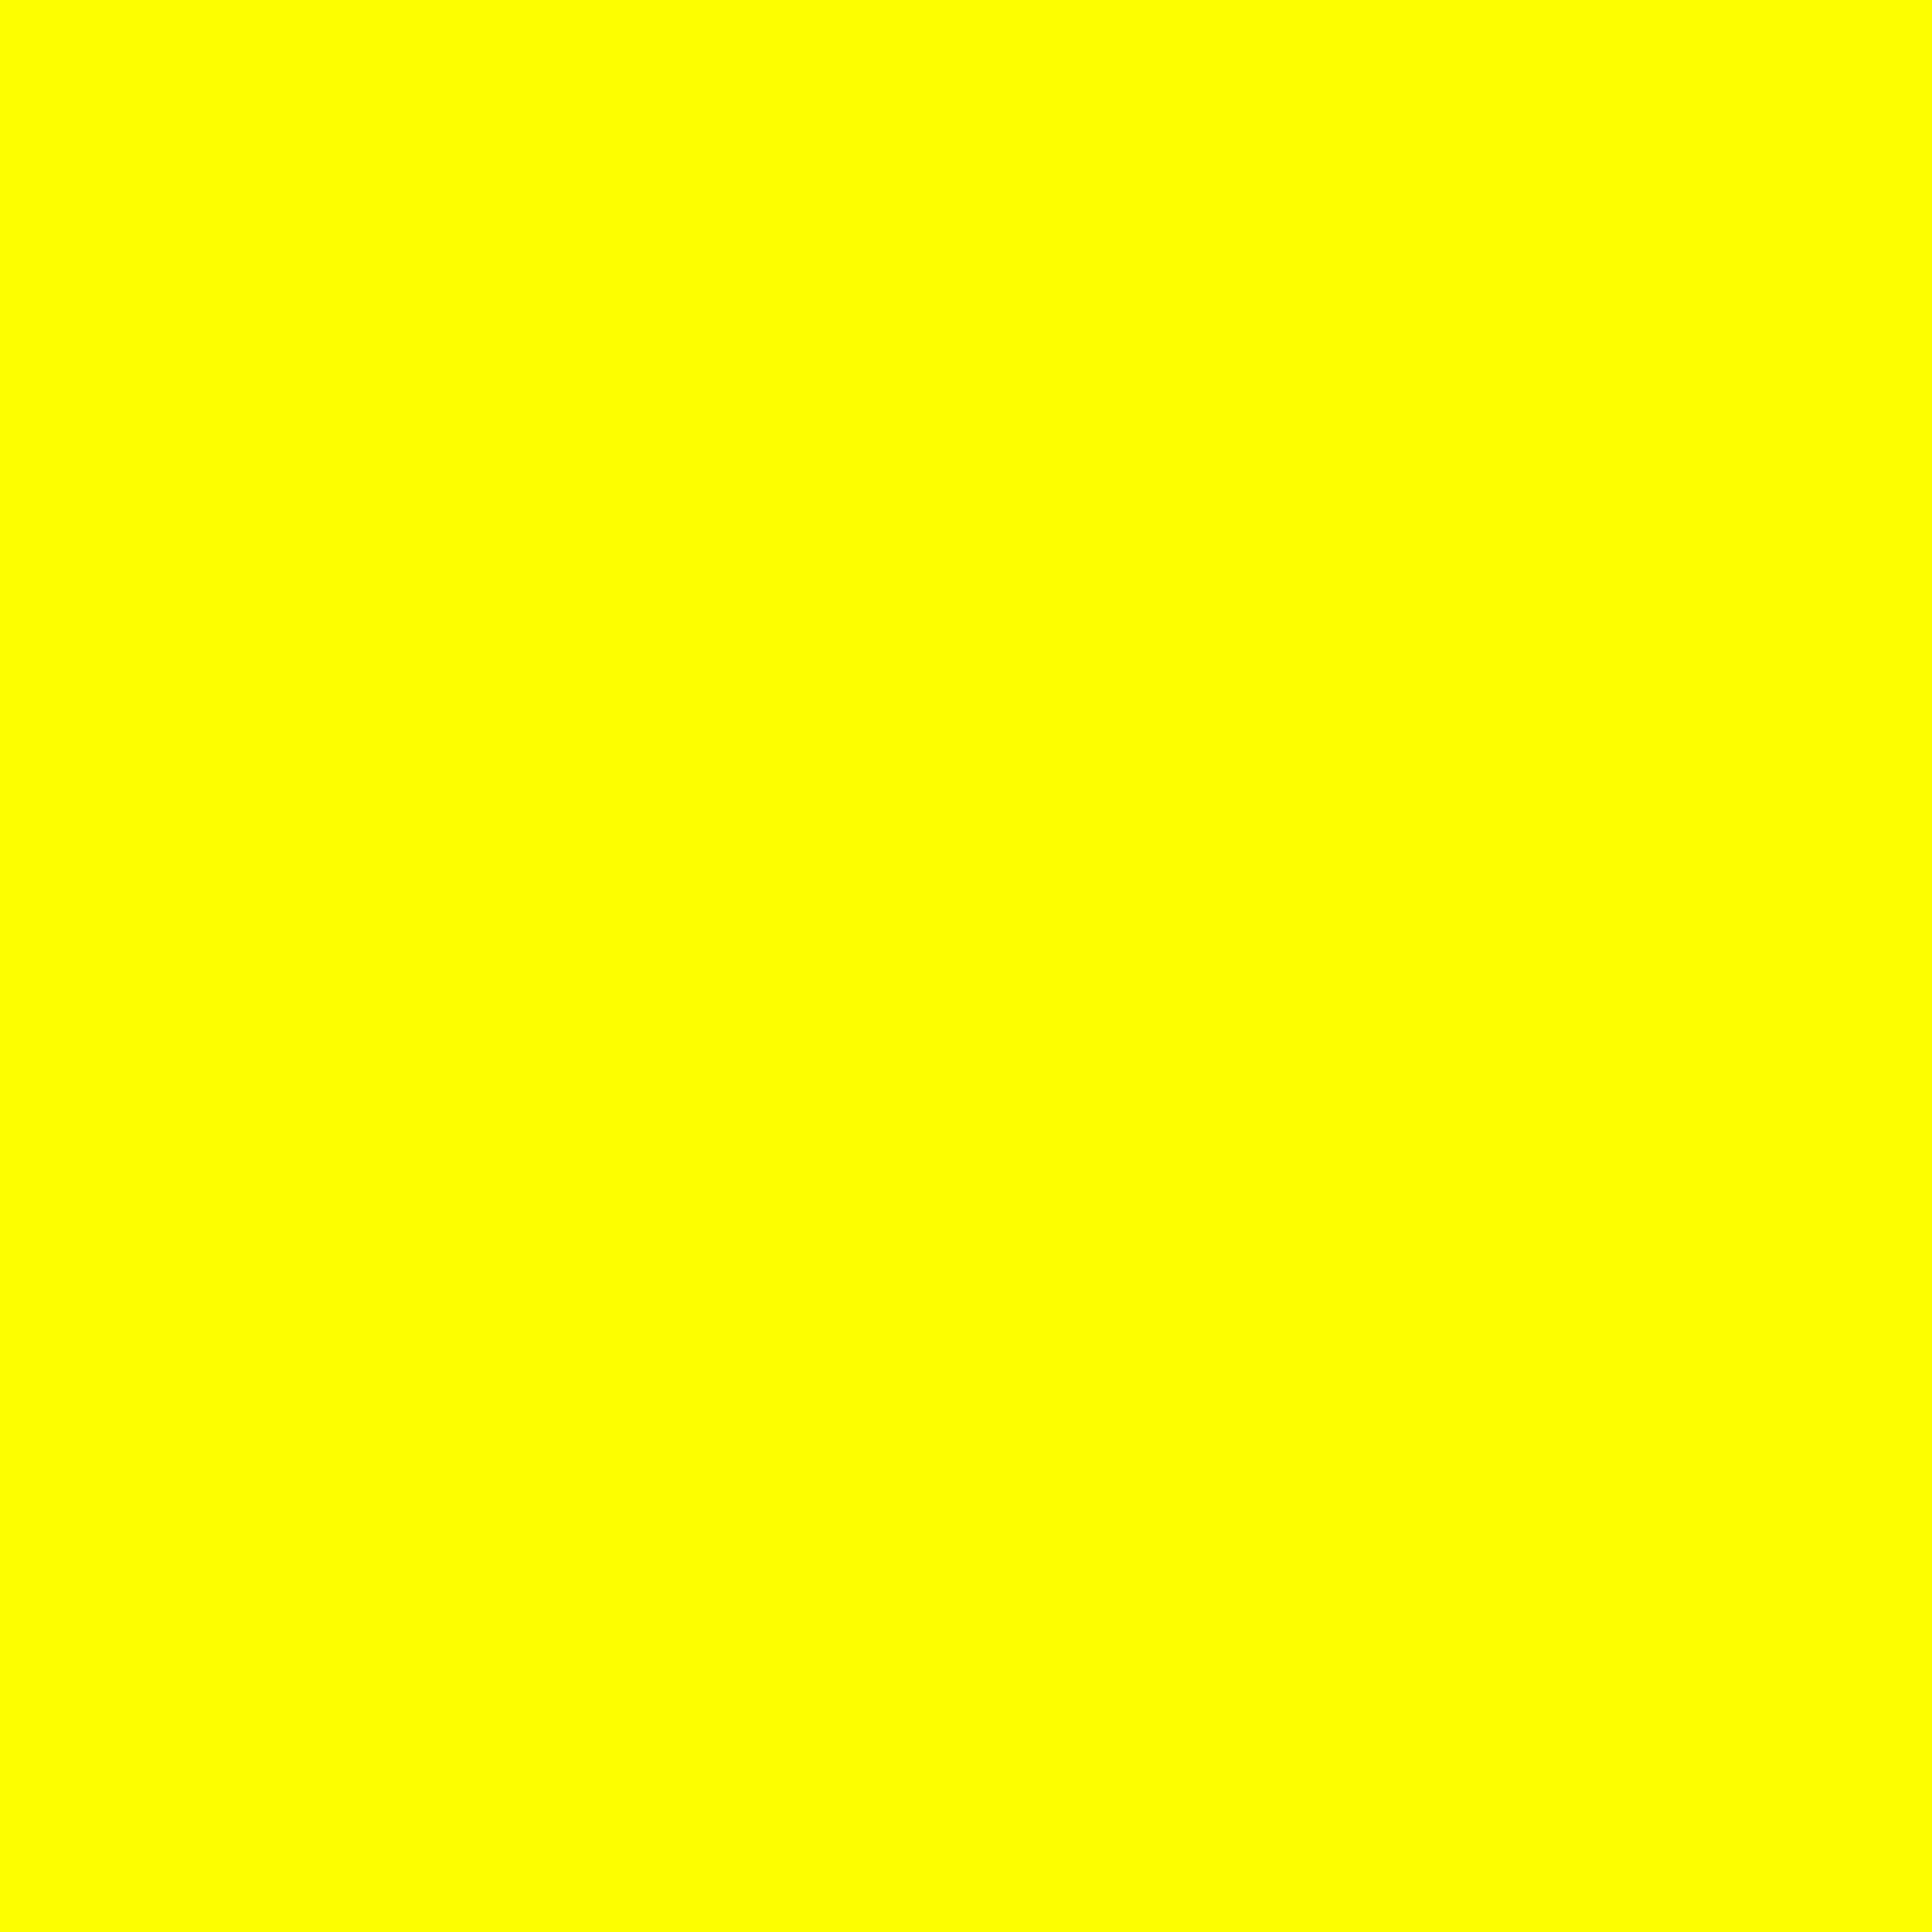 2732x2732 Lemon Glacier Solid Color Background